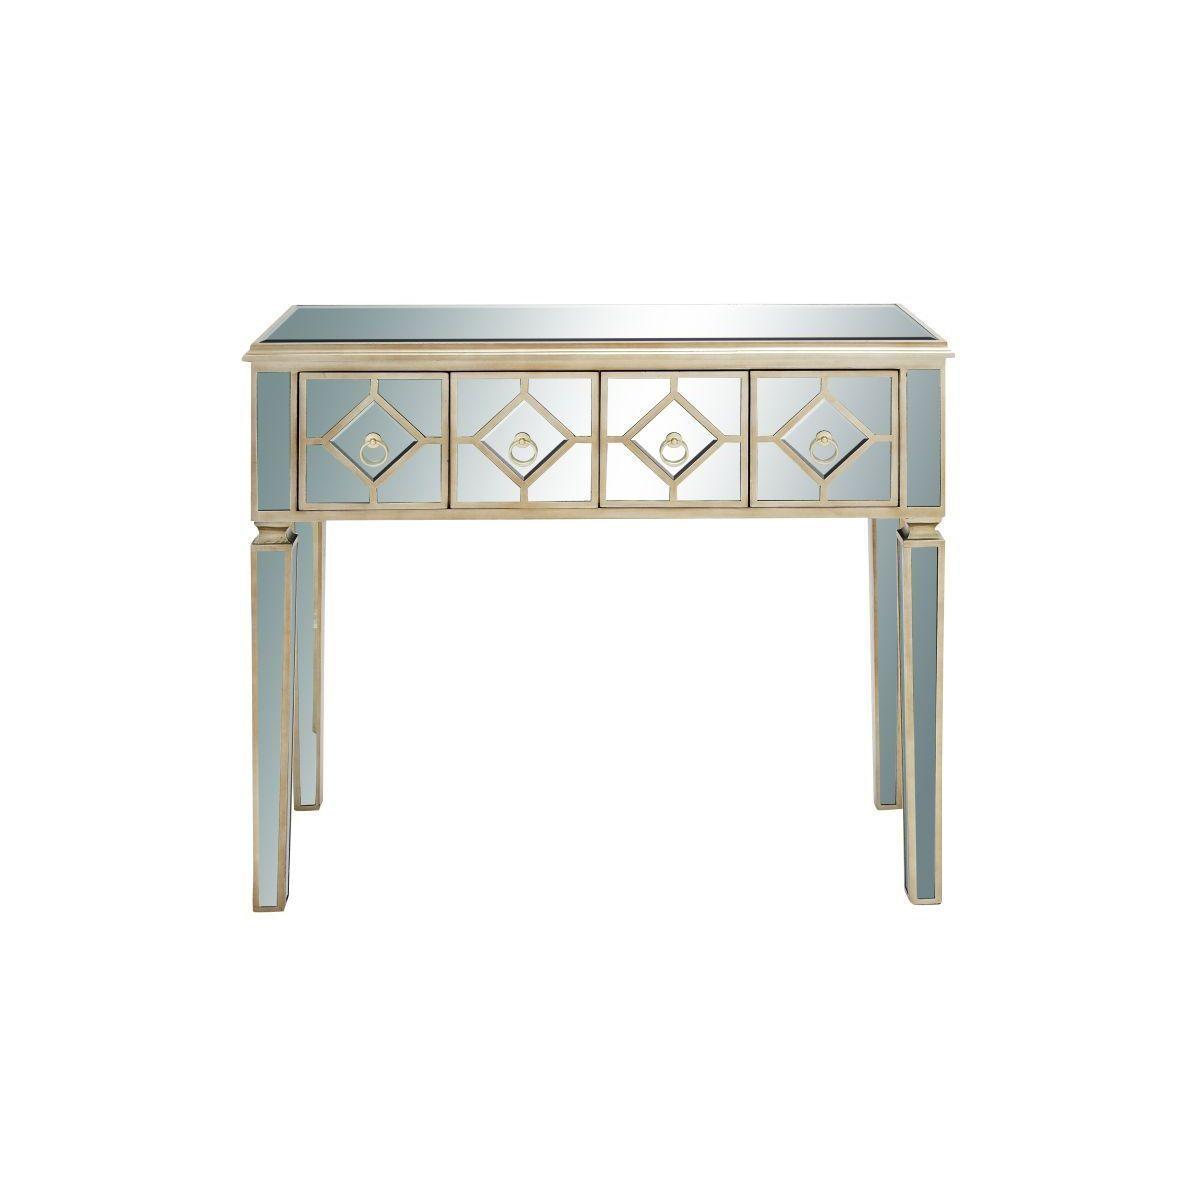 Tremendous Pin On Products Machost Co Dining Chair Design Ideas Machostcouk